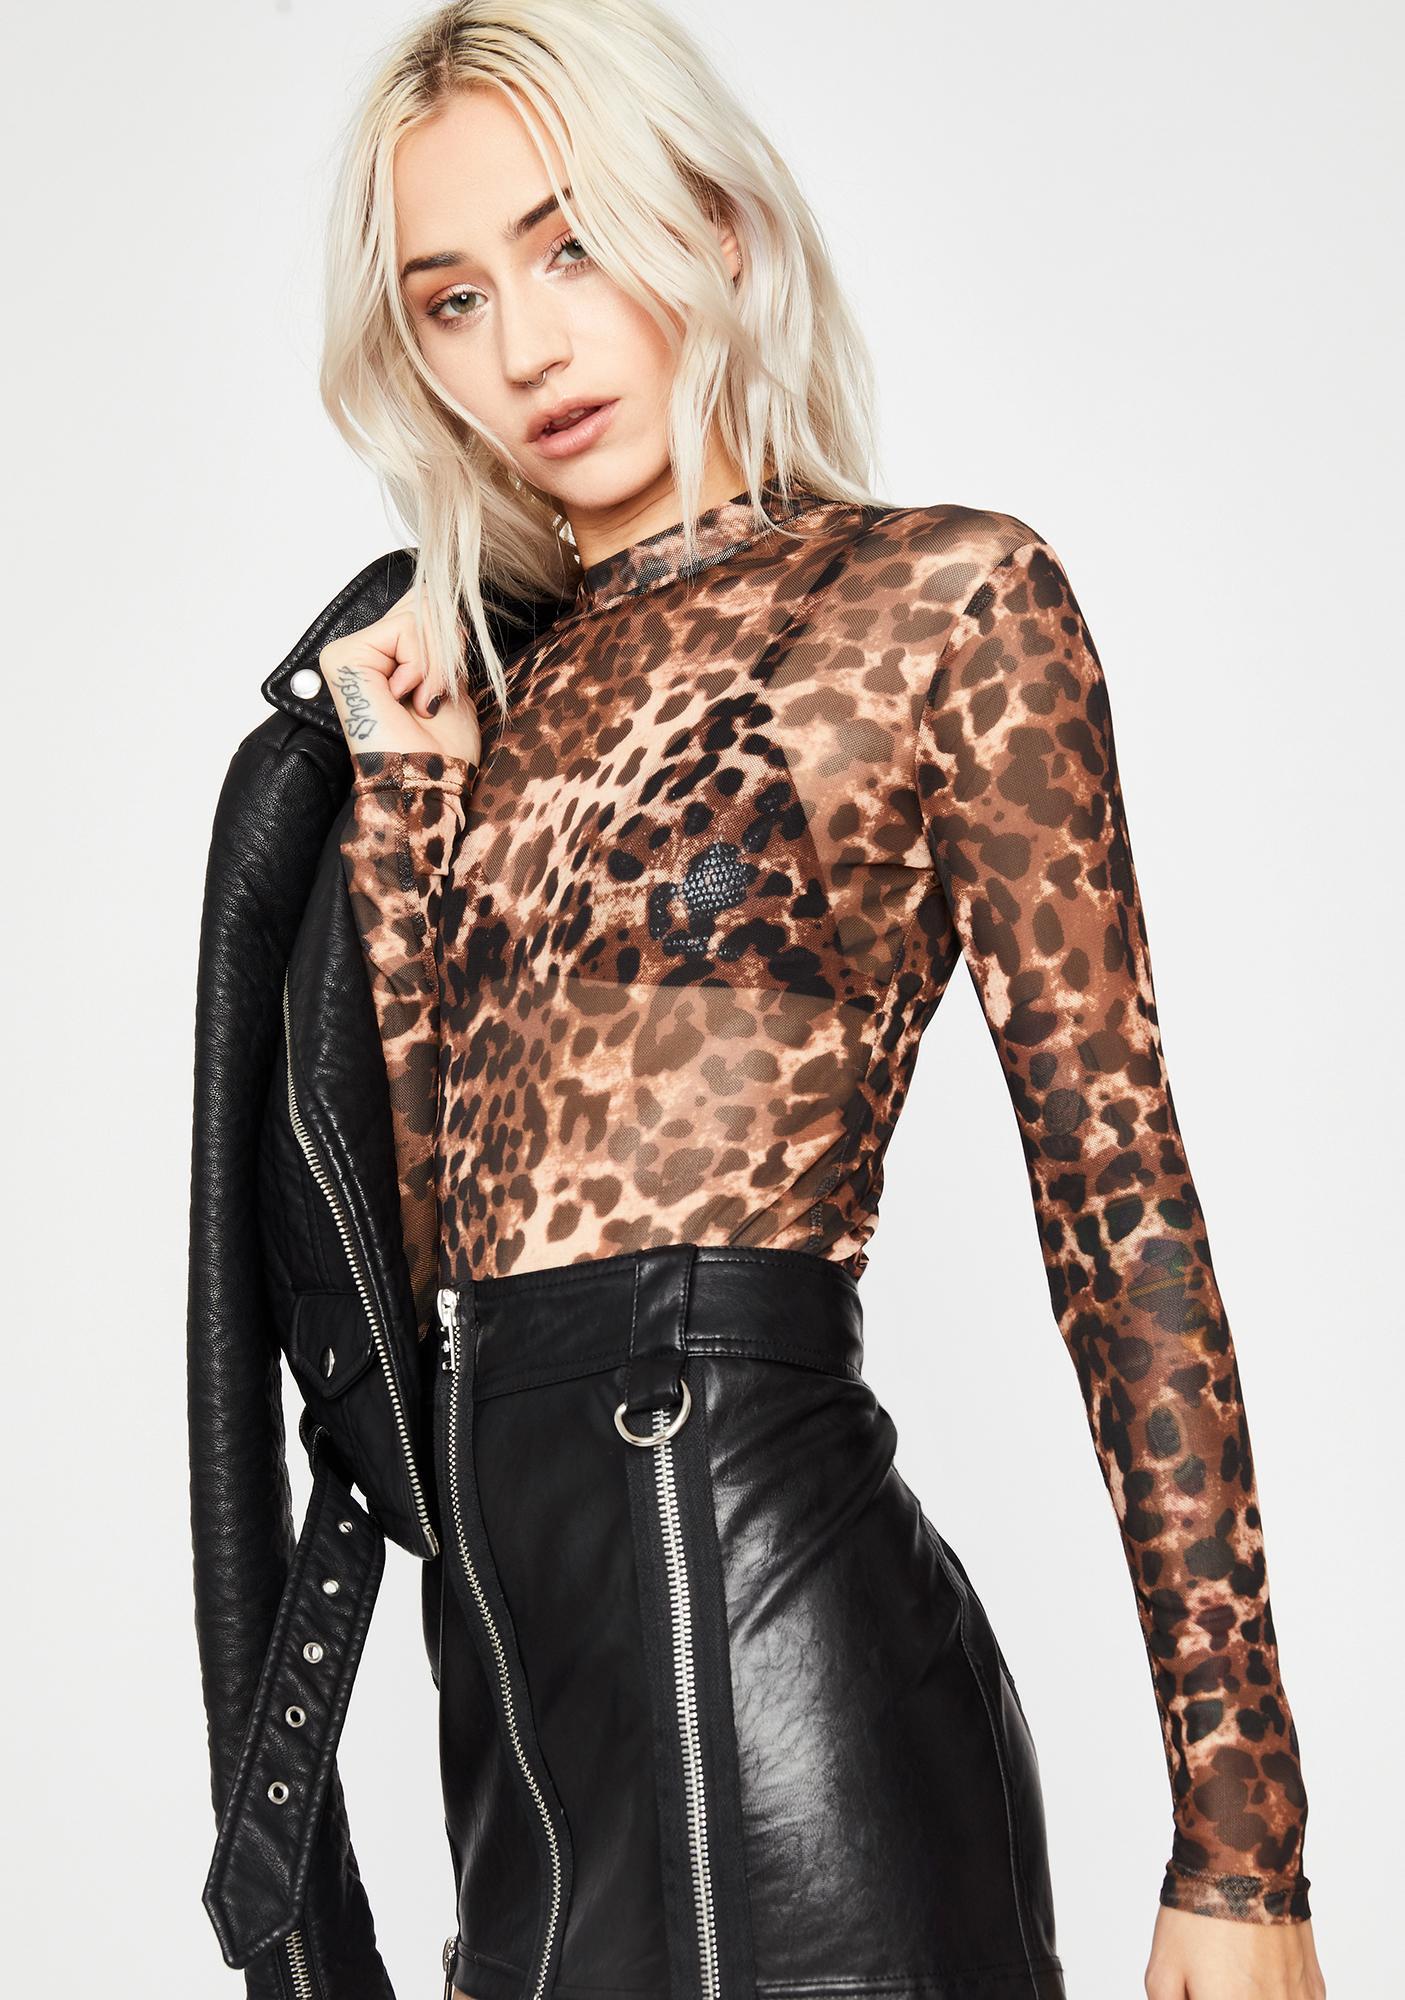 Wild Wifey Leopard Top